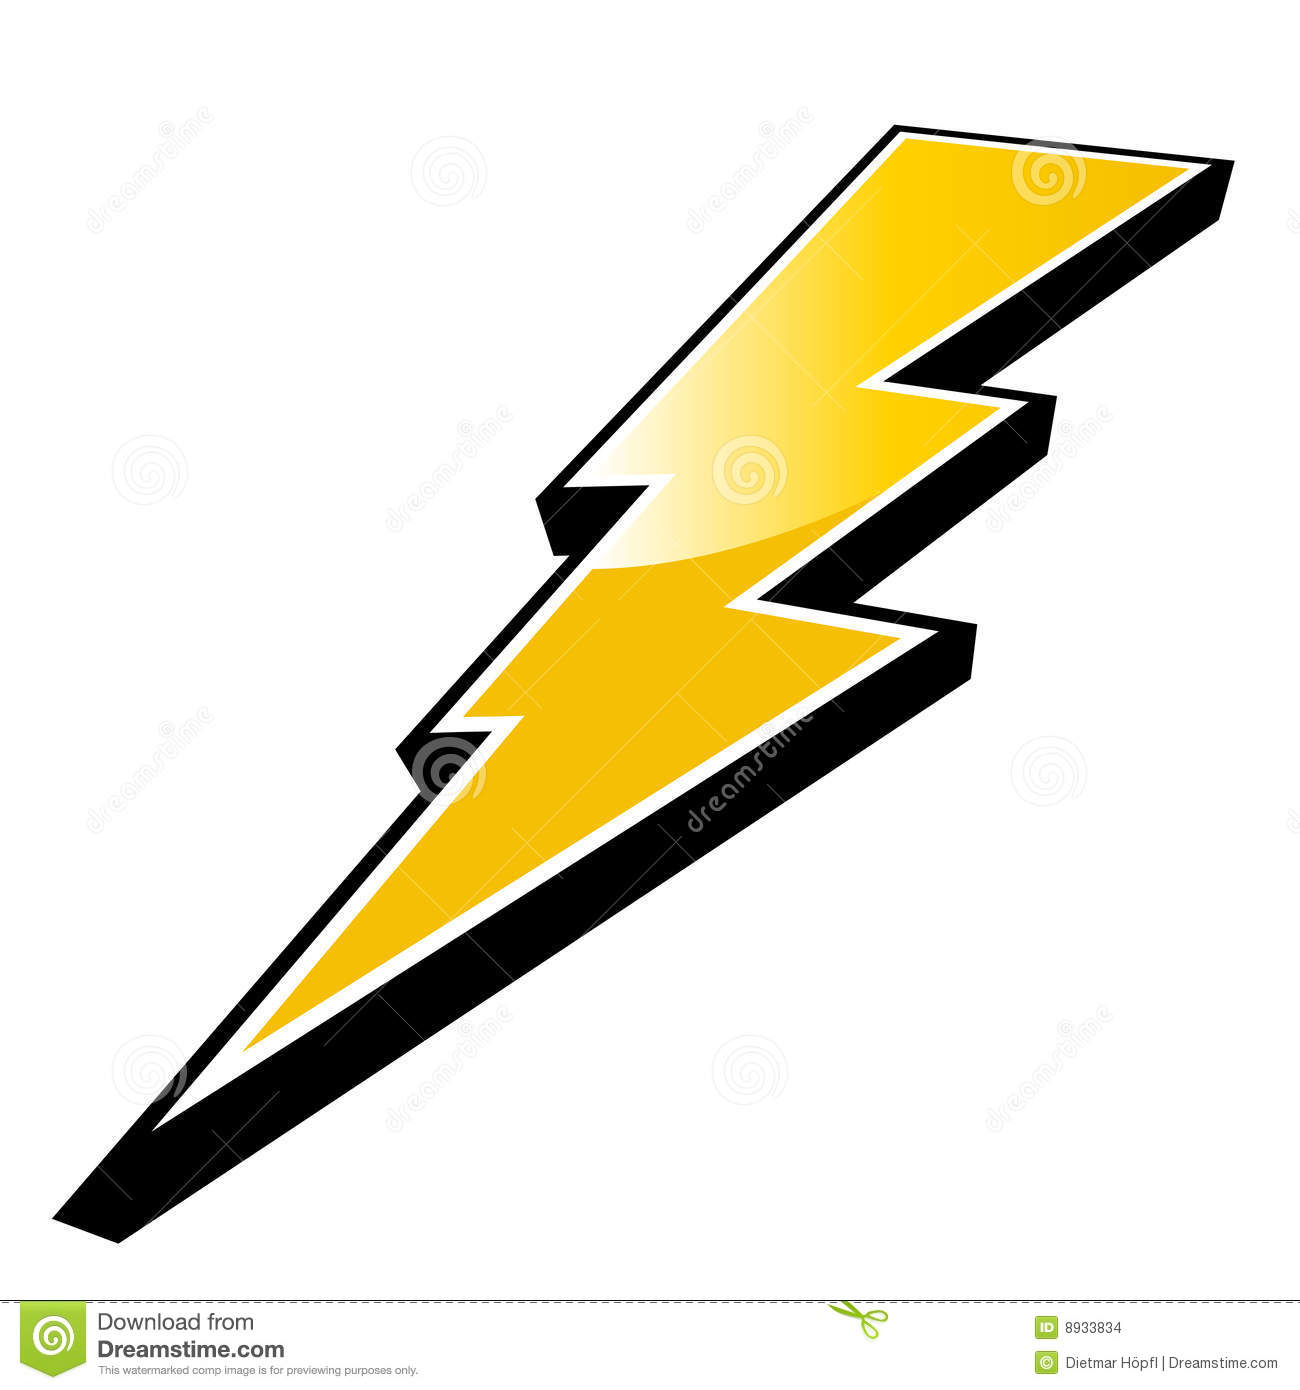 Thunderbolt clipart #6